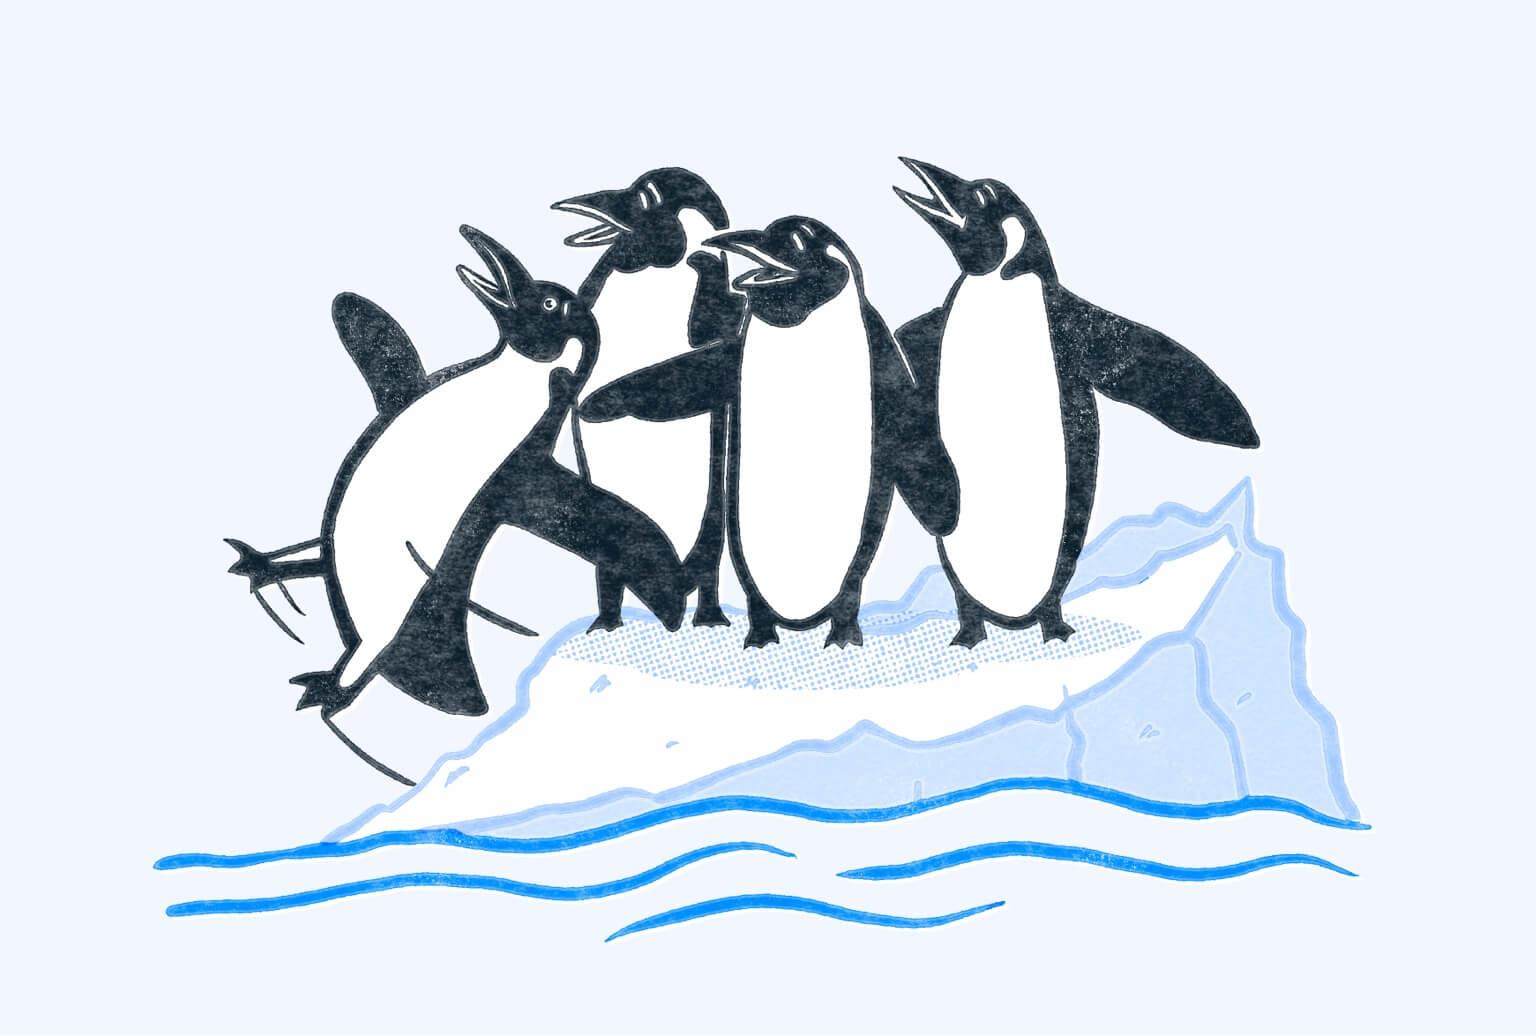 Four penguins on an iceberg. One is falling off the iceberg. Illustration.